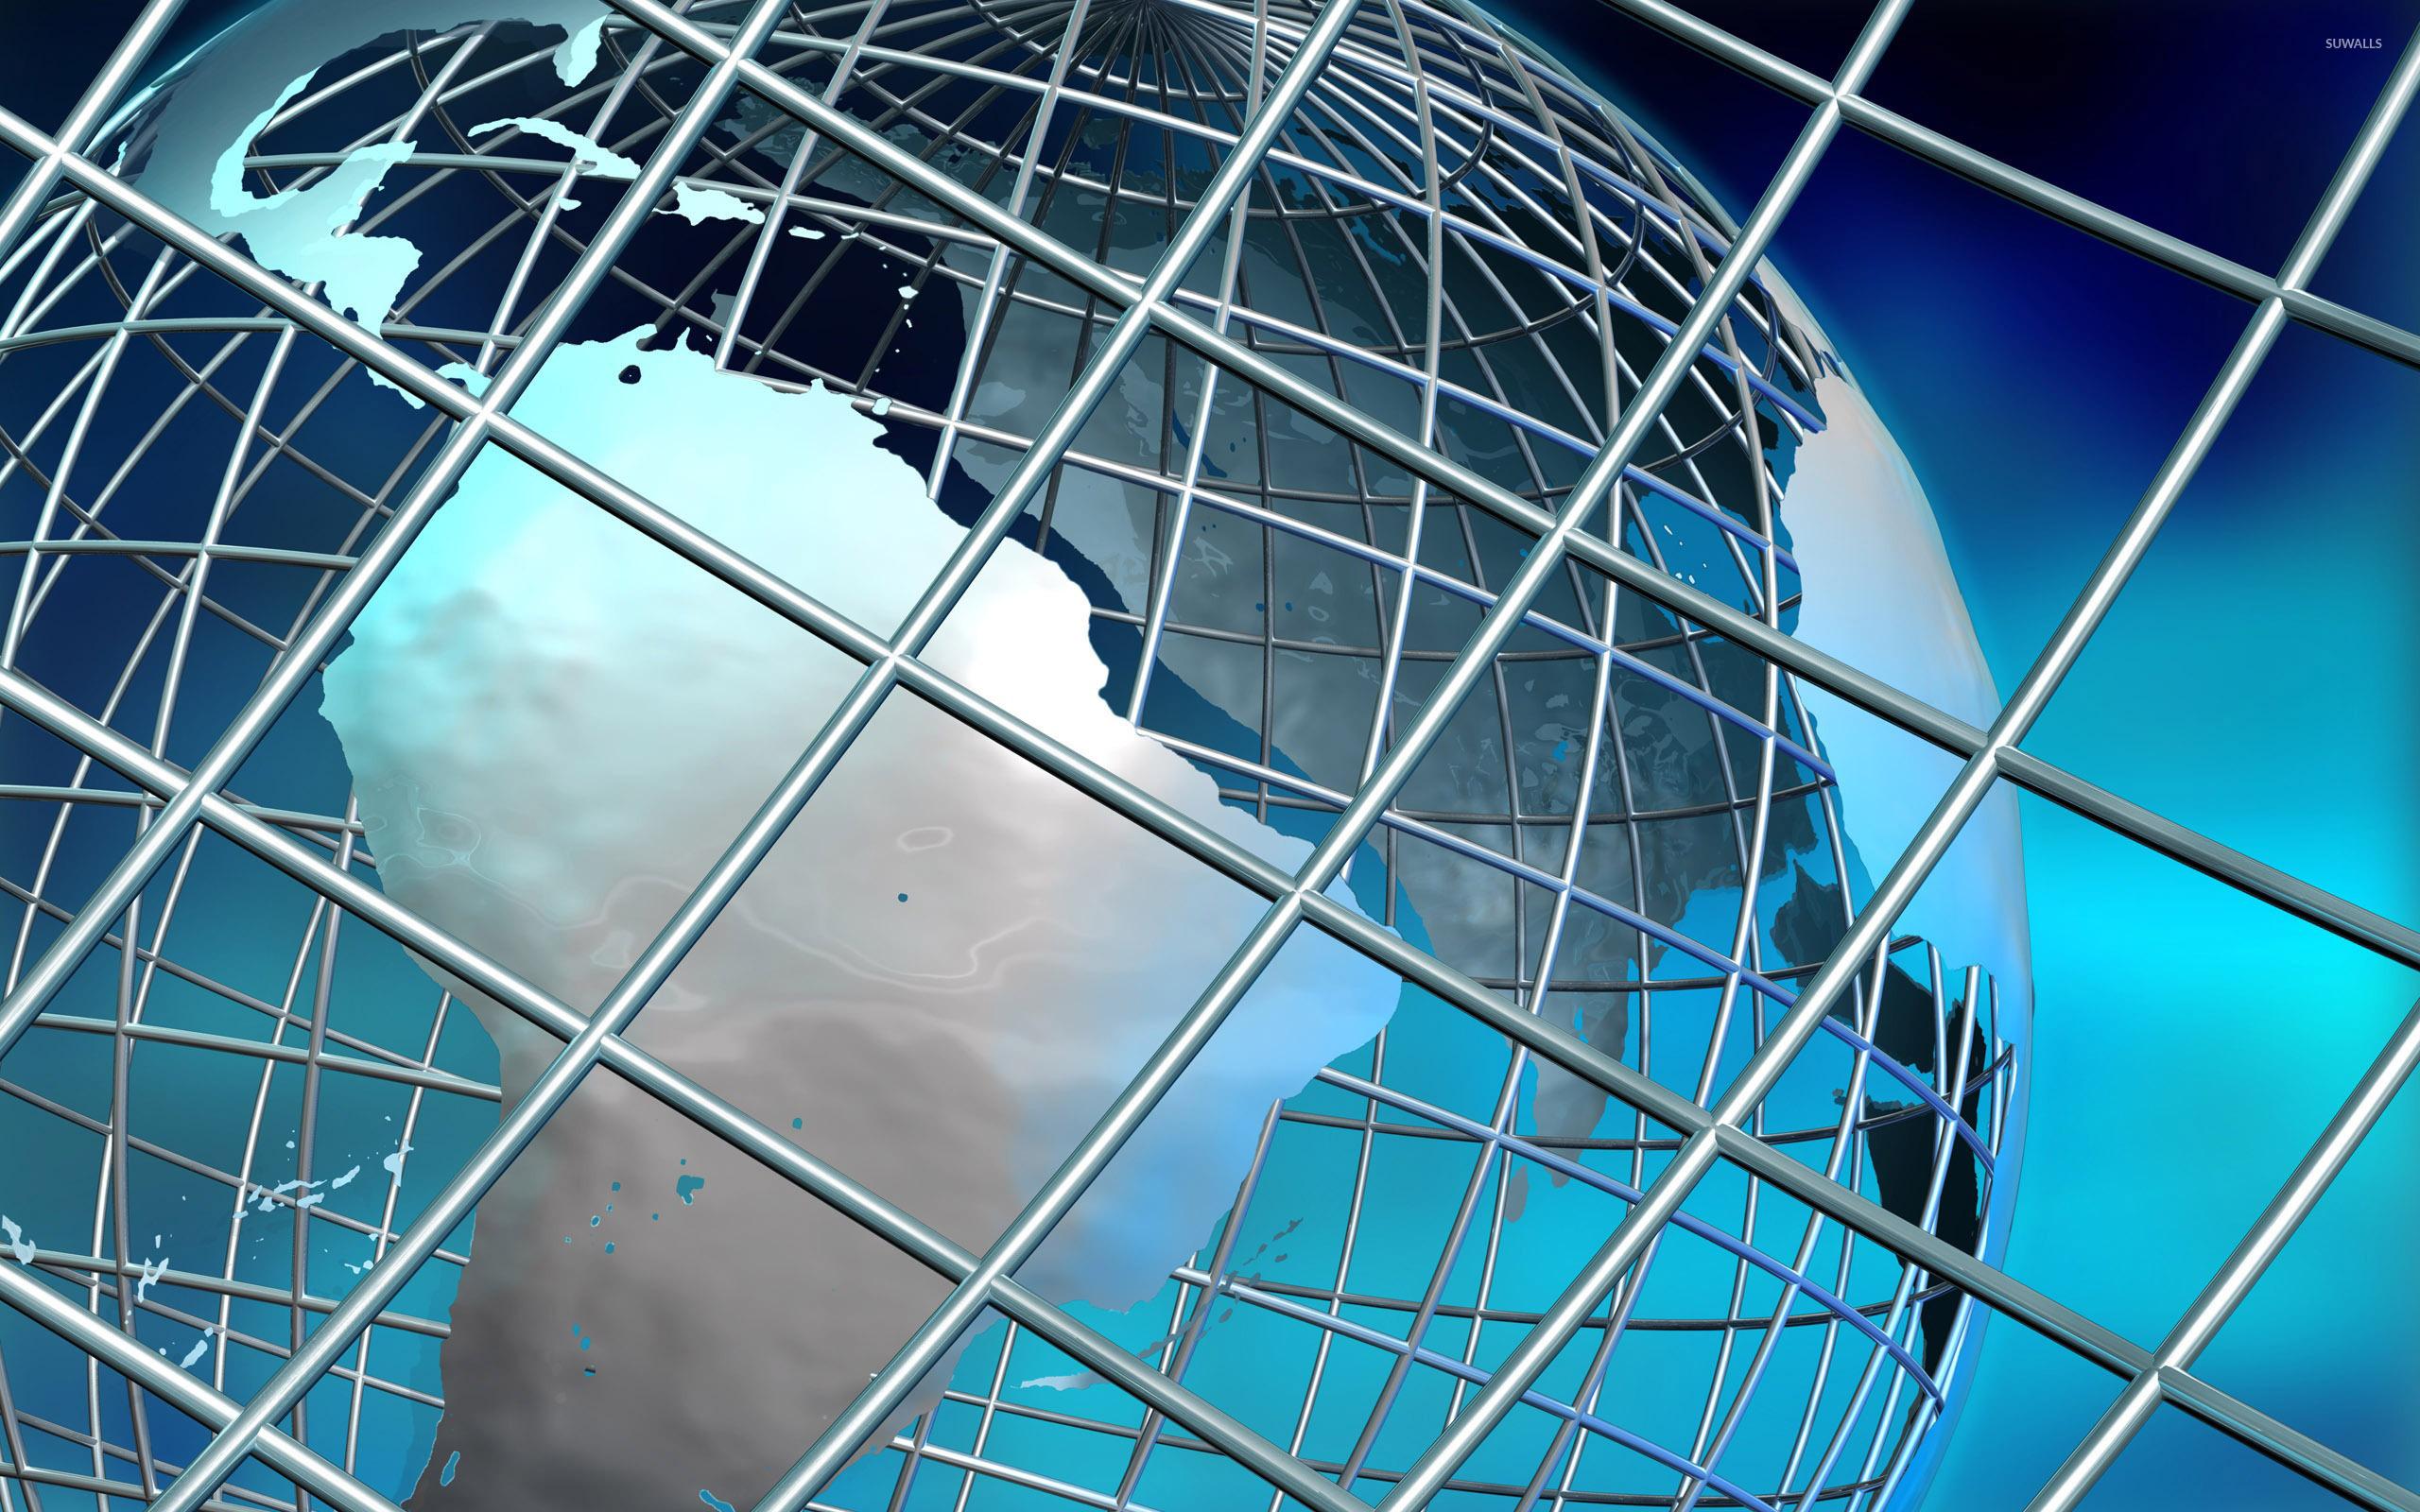 Earth on metallic web wallpaper - 3D